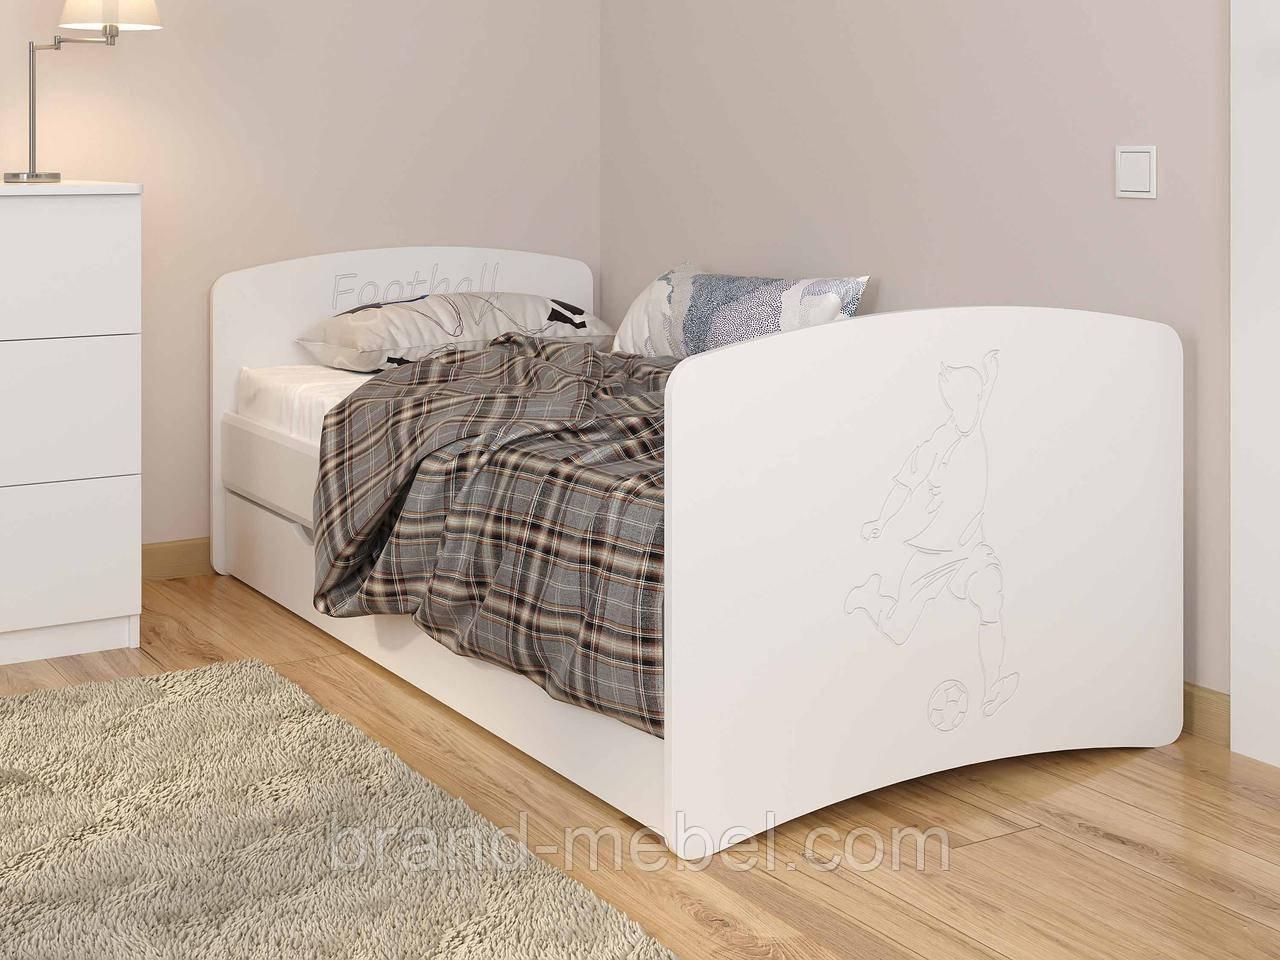 Кровать детская Футбол серии Fly / Ліжко дитяче Футбол серії Fly